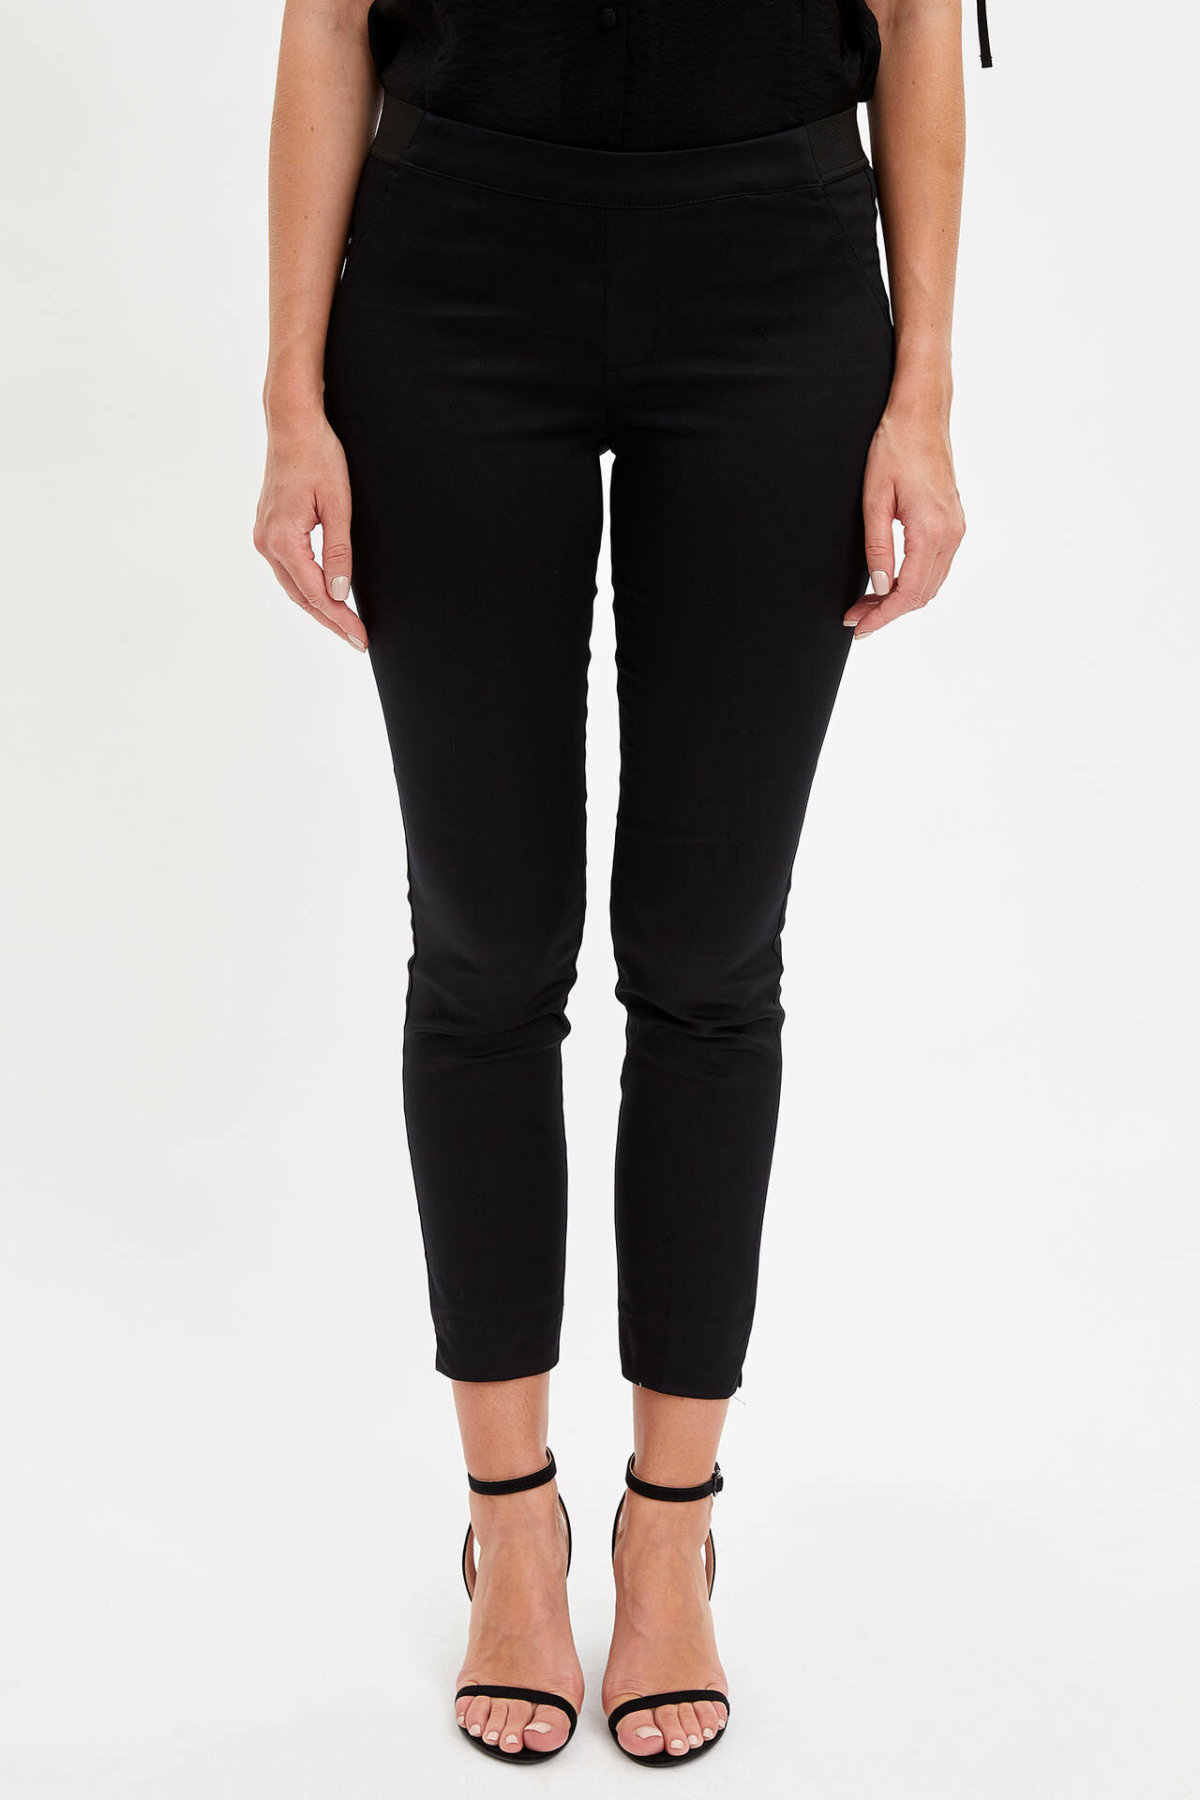 DeFacto Donna Solid Pantaloni A Vita Alta Formale Elegante Morbido Pantaloni Per Le Signore casual Affari Pantaloni Femminili-J8743AZ19AU